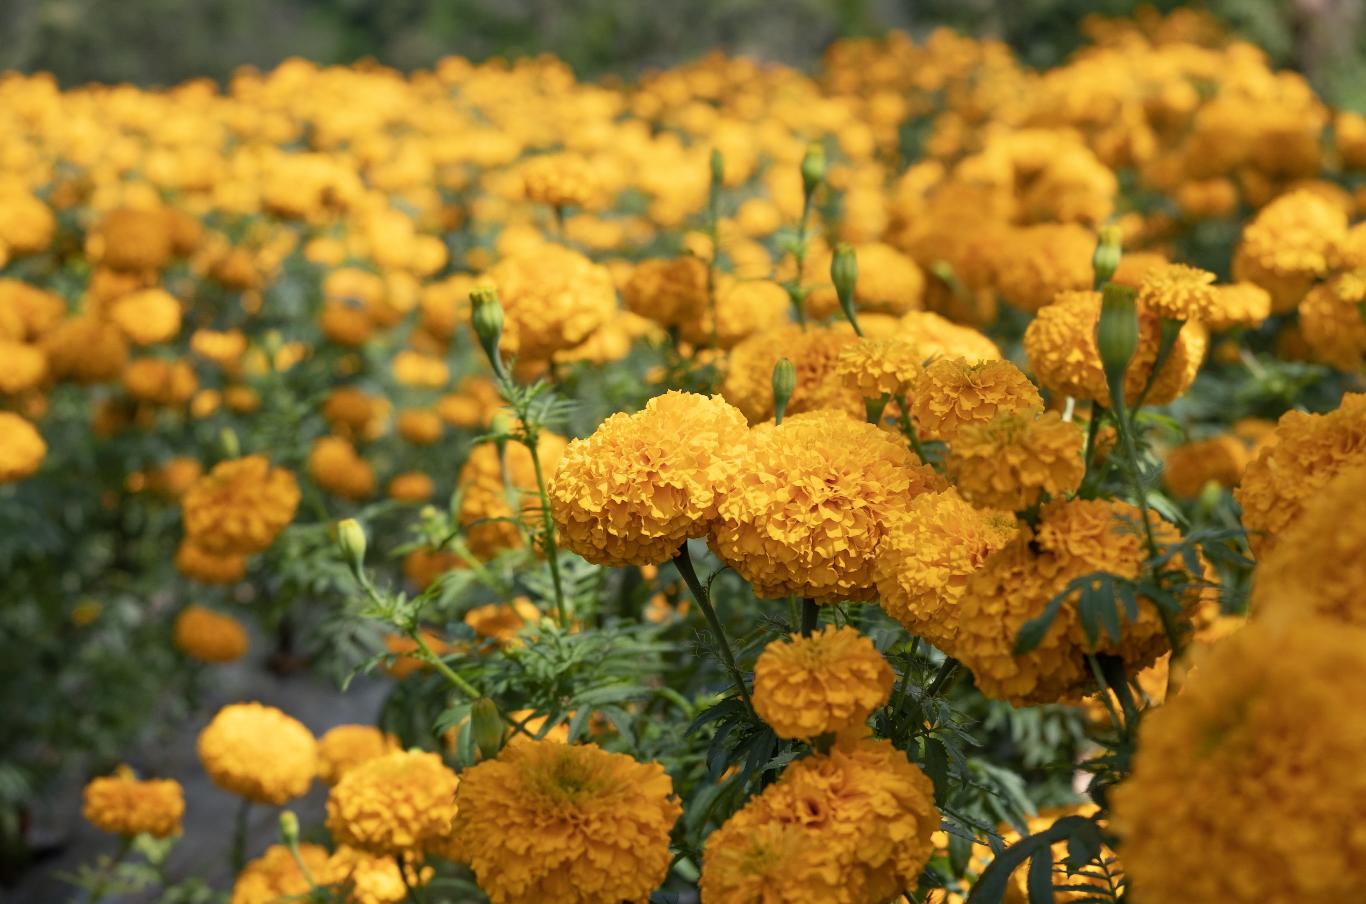 Marigold field near Negara